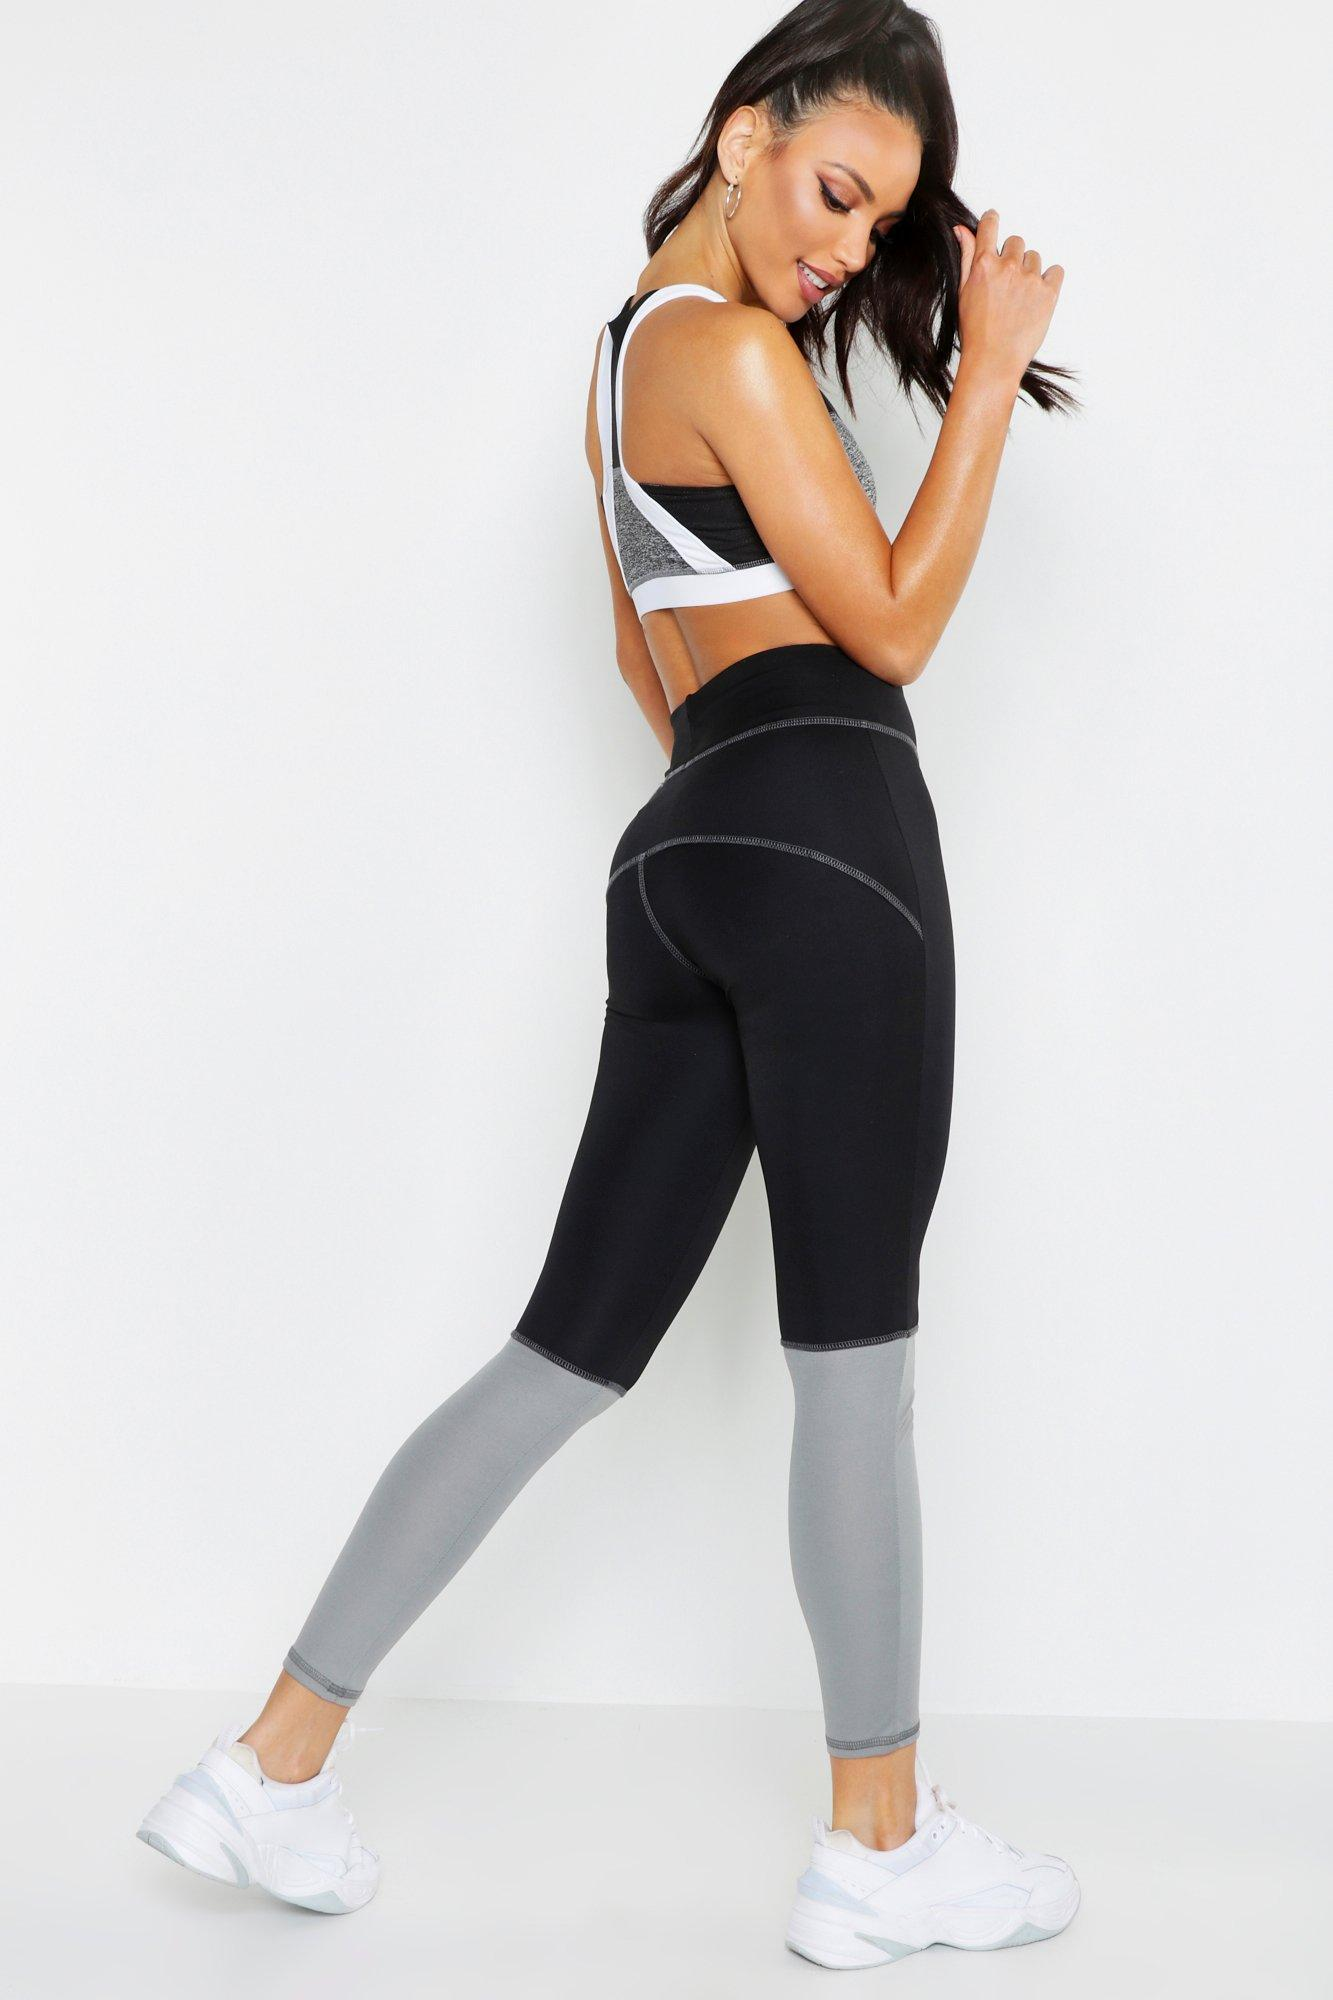 d51ca584a3923 Boohoo - Multicolor Fit Premium Geraffte Yoga Leggings - Lyst. View  fullscreen